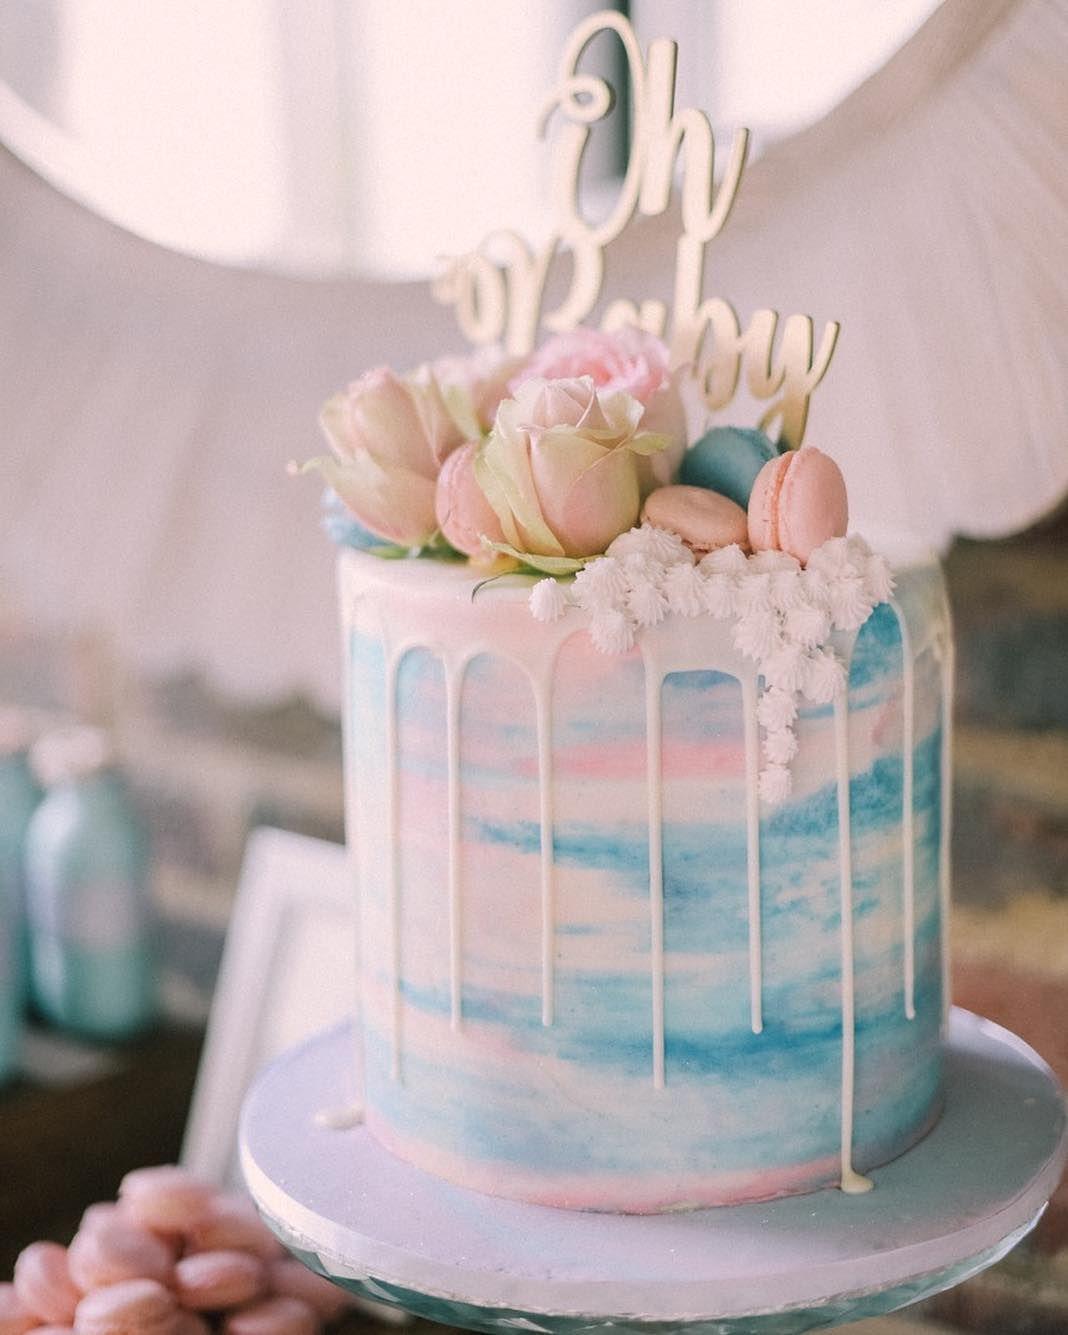 252 Gender Reveal Cake Ideas Gender Reveal Cake Gender Reveal Baby Reveal Cakes